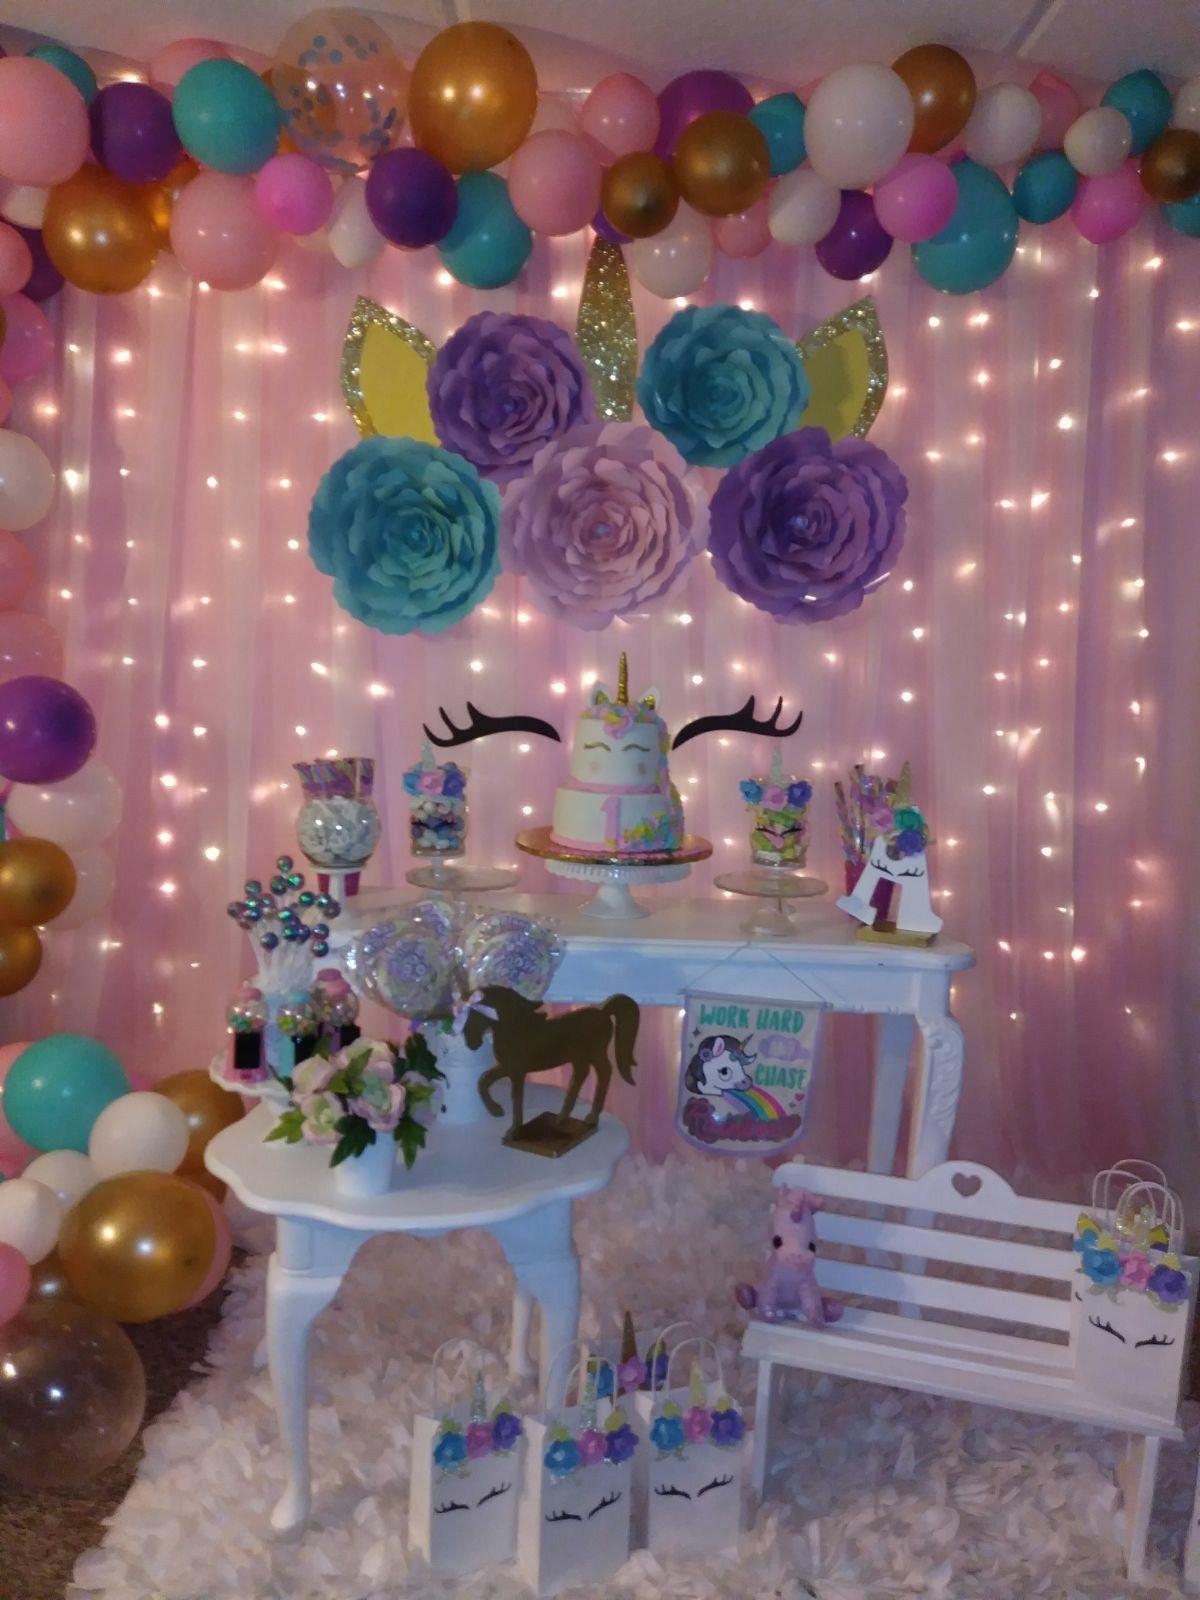 Fiesta missv unicorn birthday parties party decorations first girl also cumpleanos unicornio rh pinterest